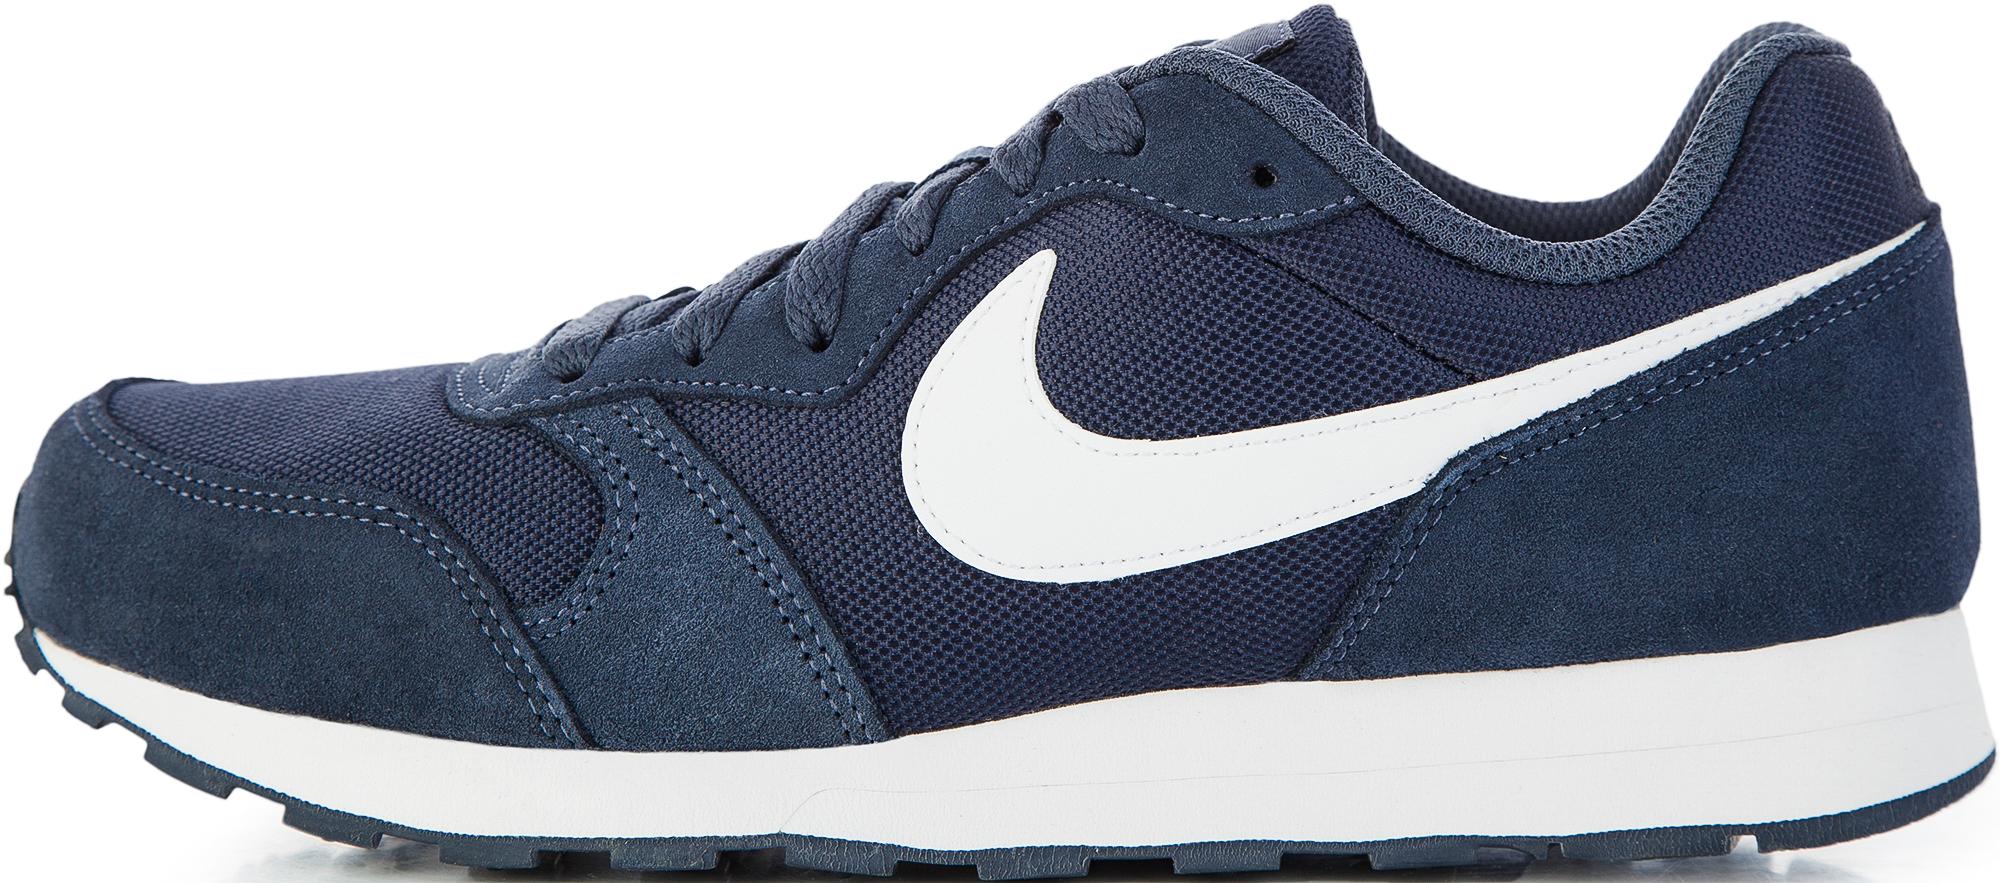 Nike Кроссовки для мальчиков Nike Md Runner 2, размер 38